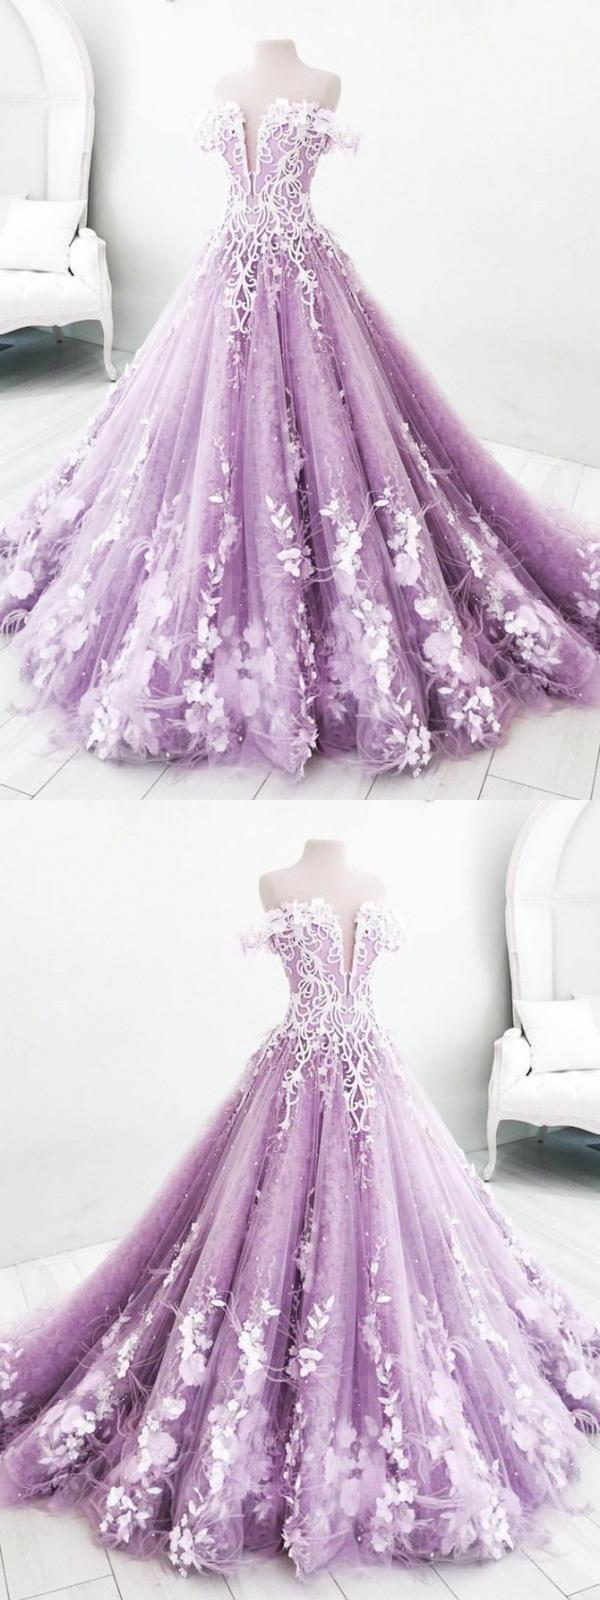 Cheap Delightful Prom Dress Vintage, Long Prom Dress, Prom Dress Ball Gown, 2019 Prom Dress – Sierra Nelson